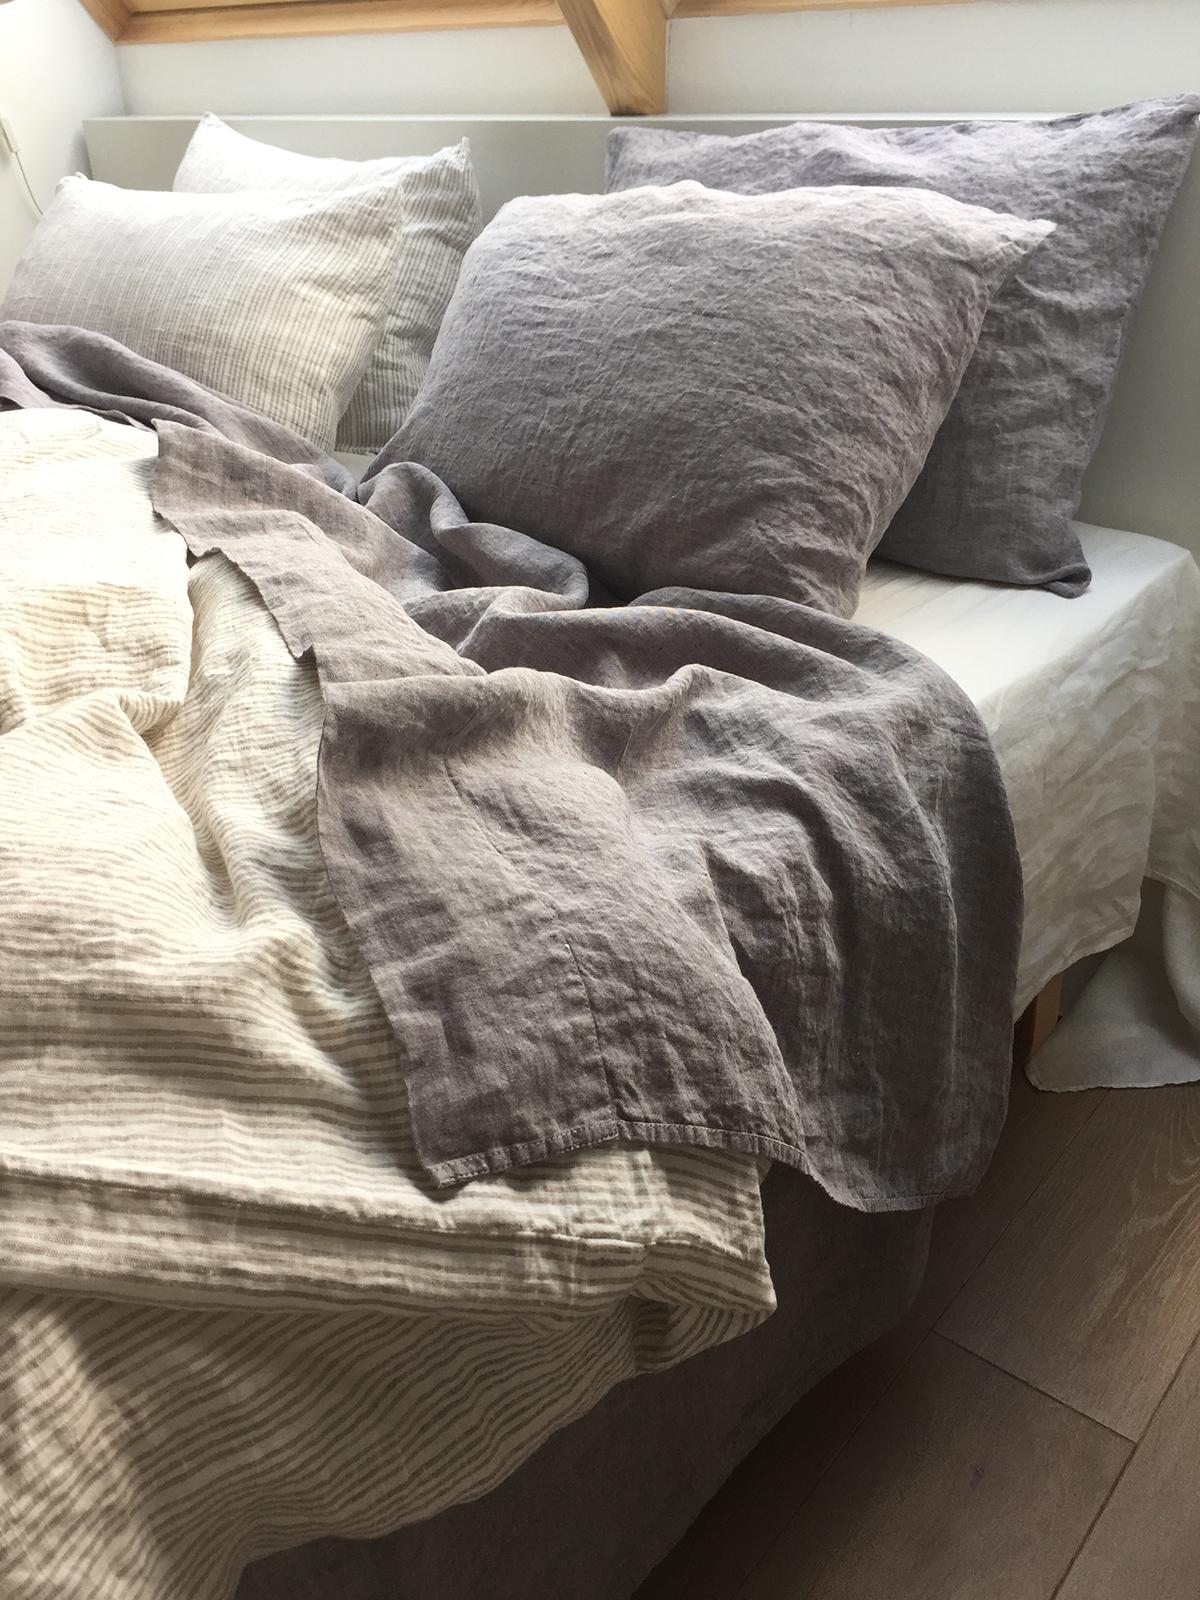 for Linen Bedding, Sheets